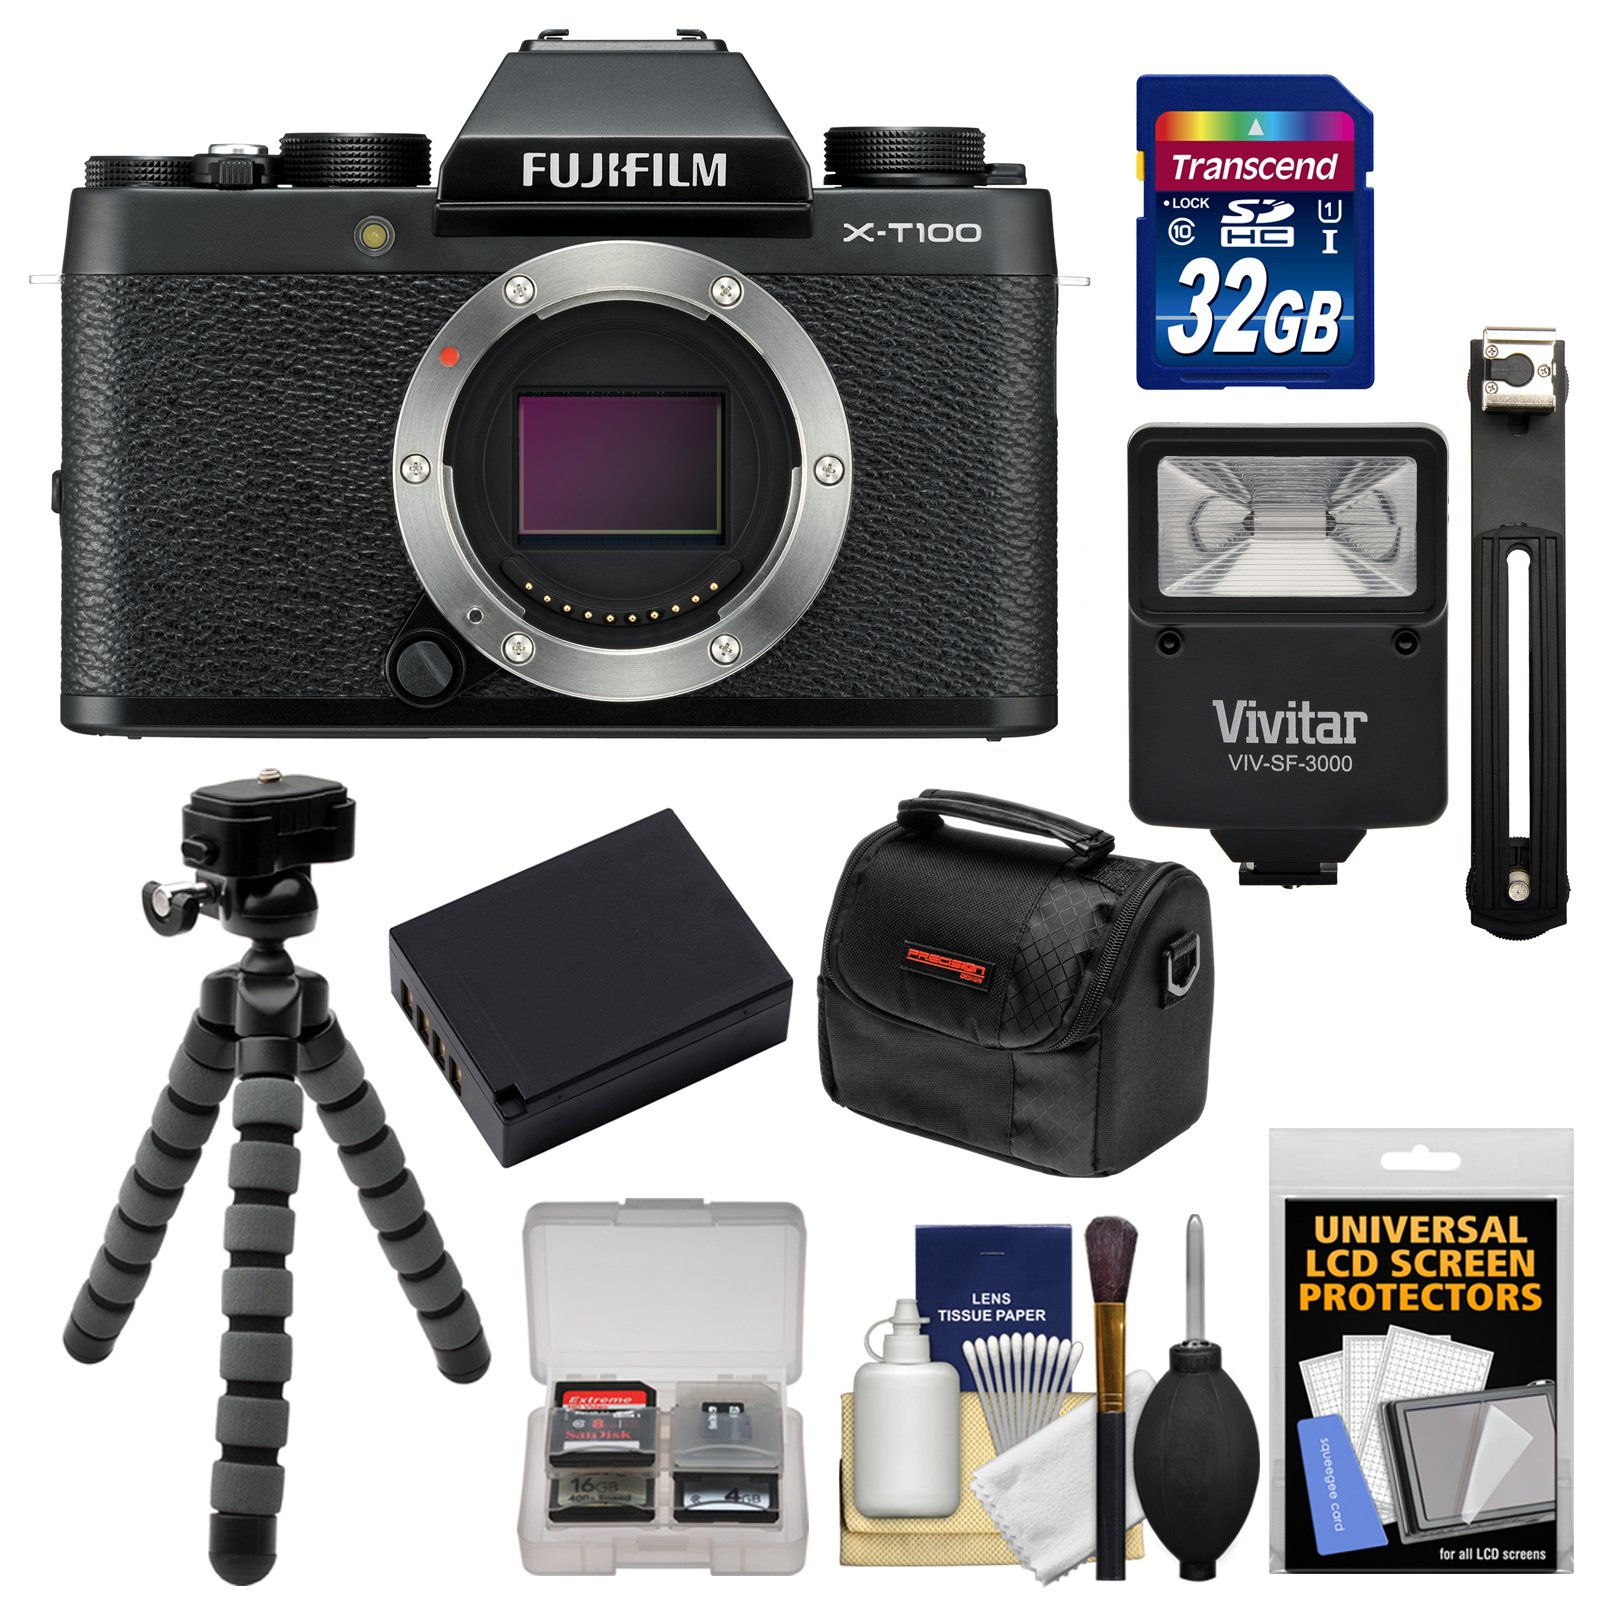 Fujifilm X-T100 Digital Camera Body (Black) with 32GB Card + Battery + Tripod + Flash + Case + Kit by Fujifilm